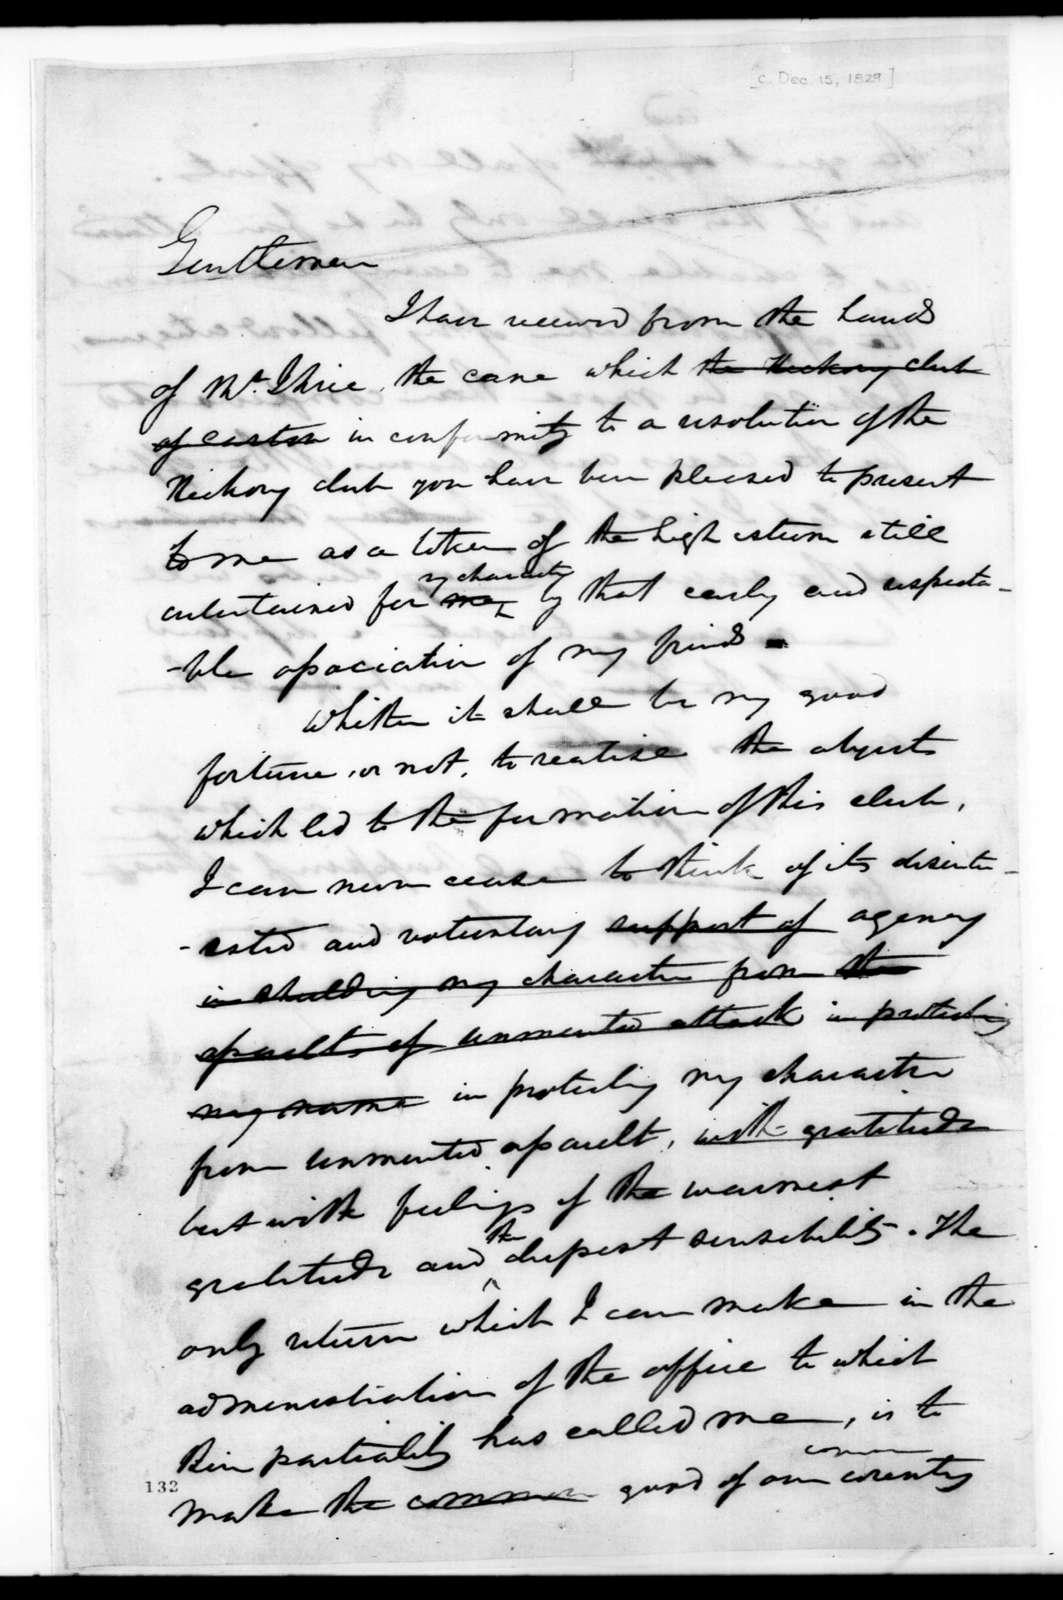 Andrew Jackson to Hickory Club, December 15, 1829